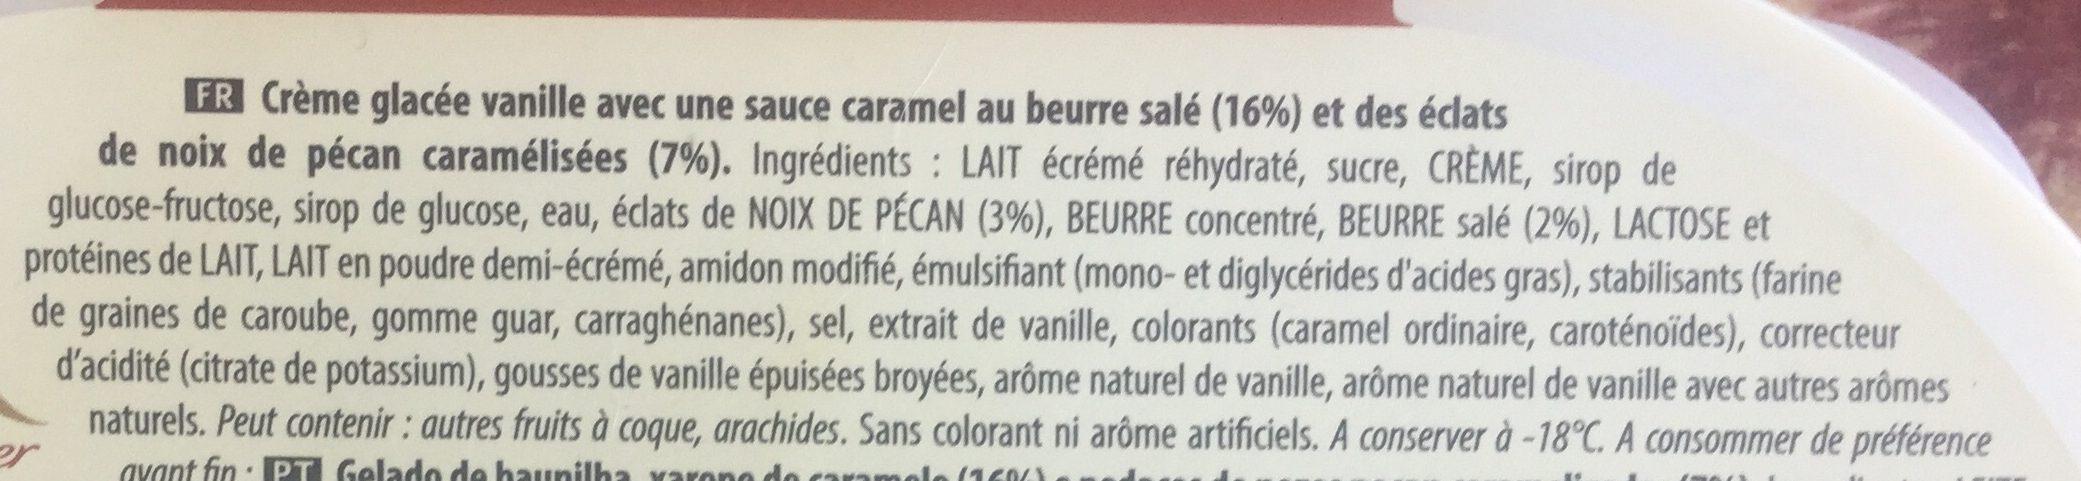 Carte D'or Les Desserts Glace Vanille Noix de Pecan 900ml - Ingrediënten - fr